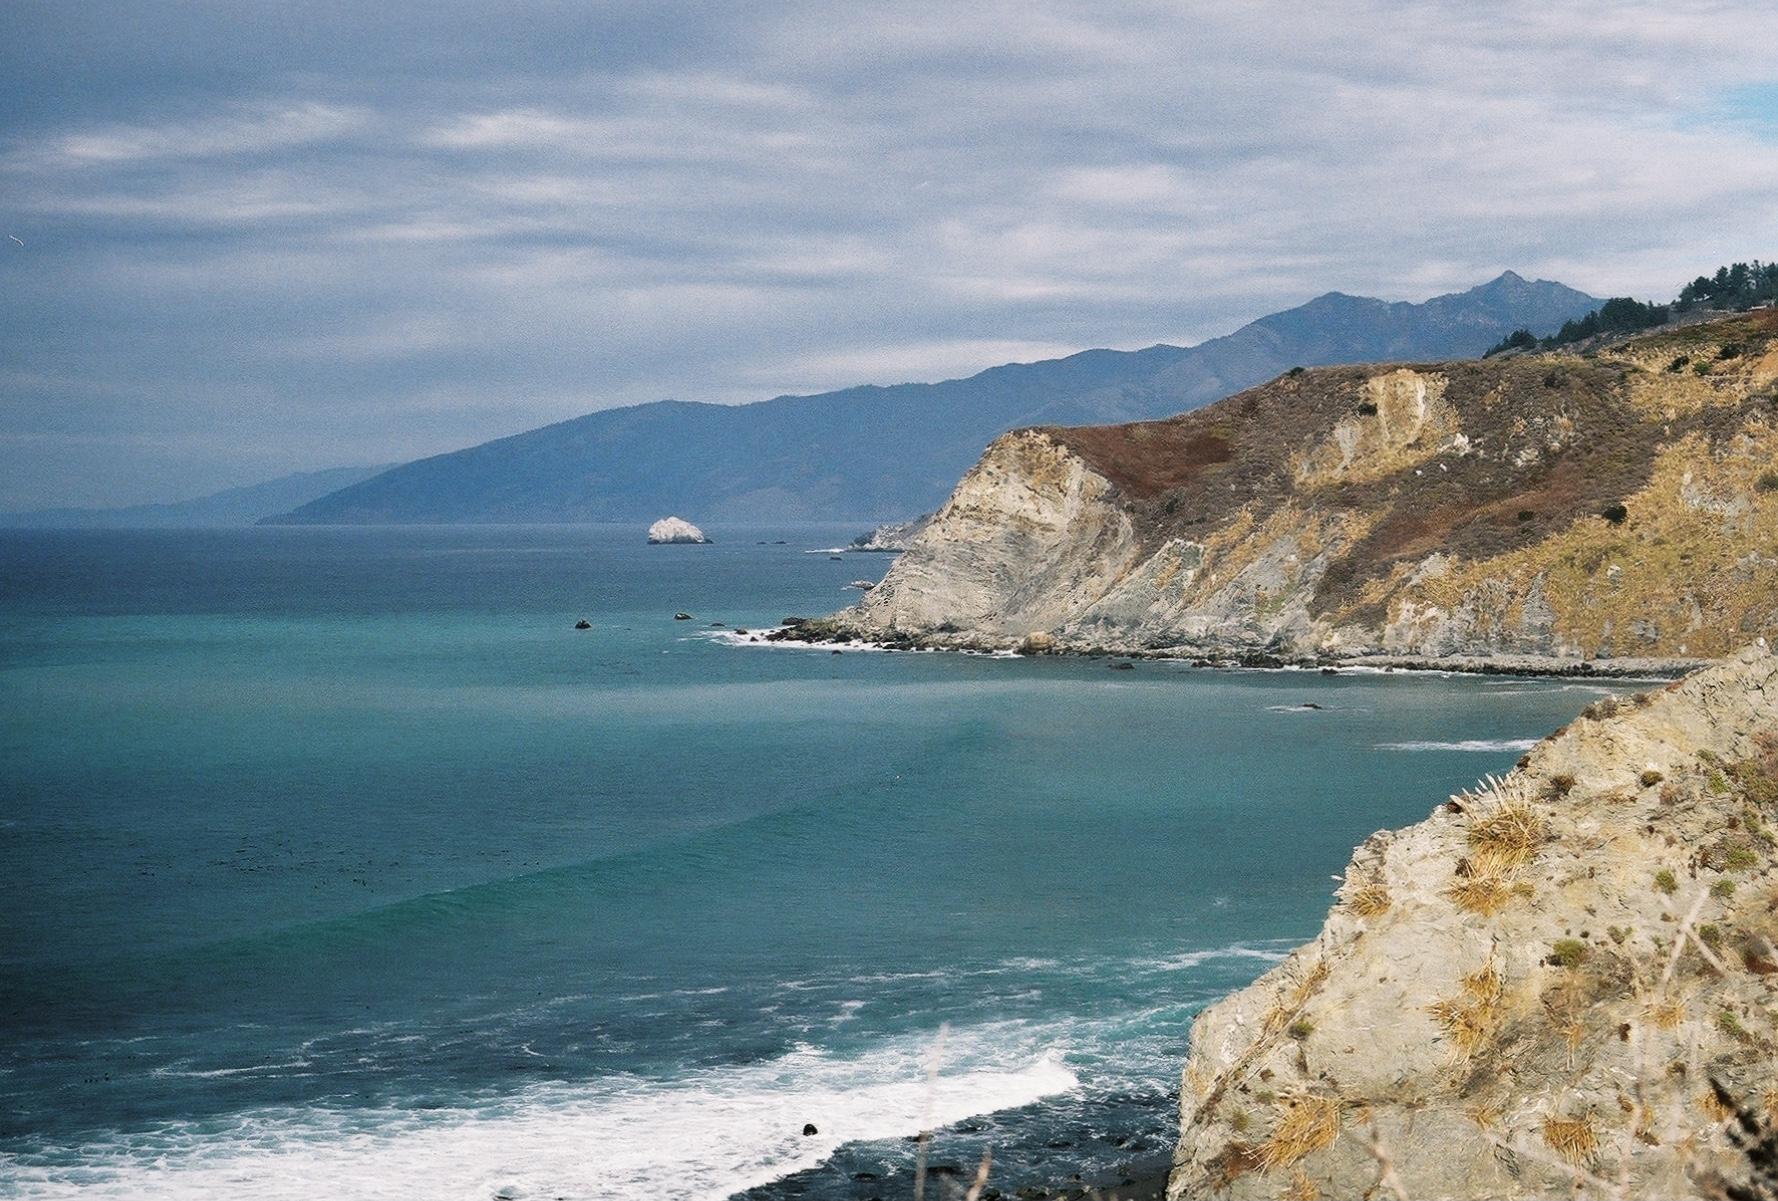 35mm film photograph of Big Sur California